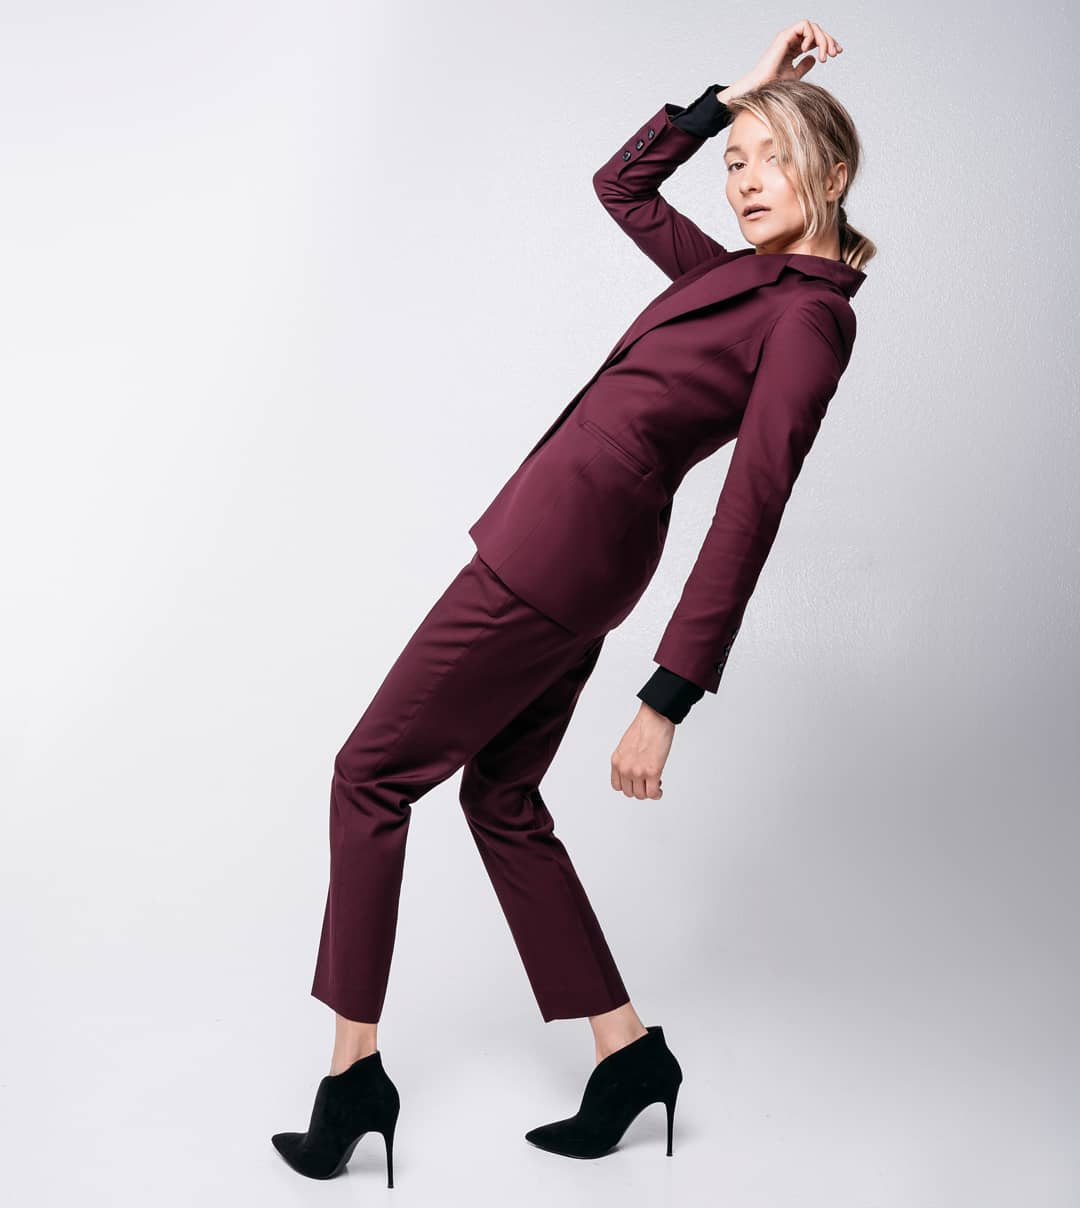 Zeglio Custom Clothiers – Chicago Lakeview